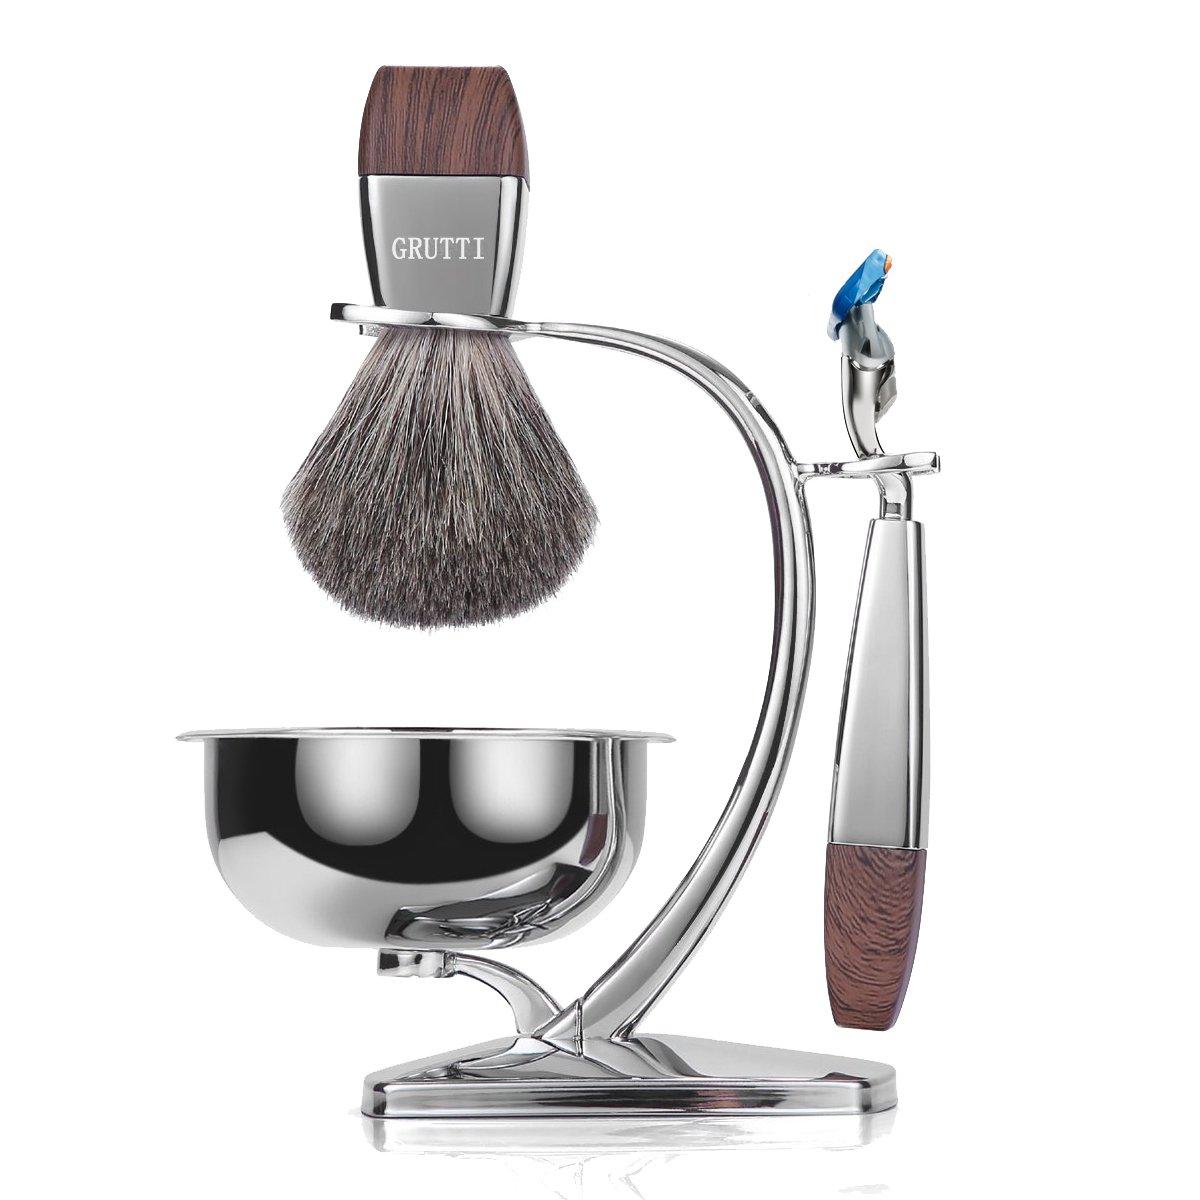 GRUTTI Premium Shaving Brush Set with Luxury Brush Stand and Brush holder for Soap Bowl and Manual Razor (Fusion 5) Kits for Men (Badger Hair Version)